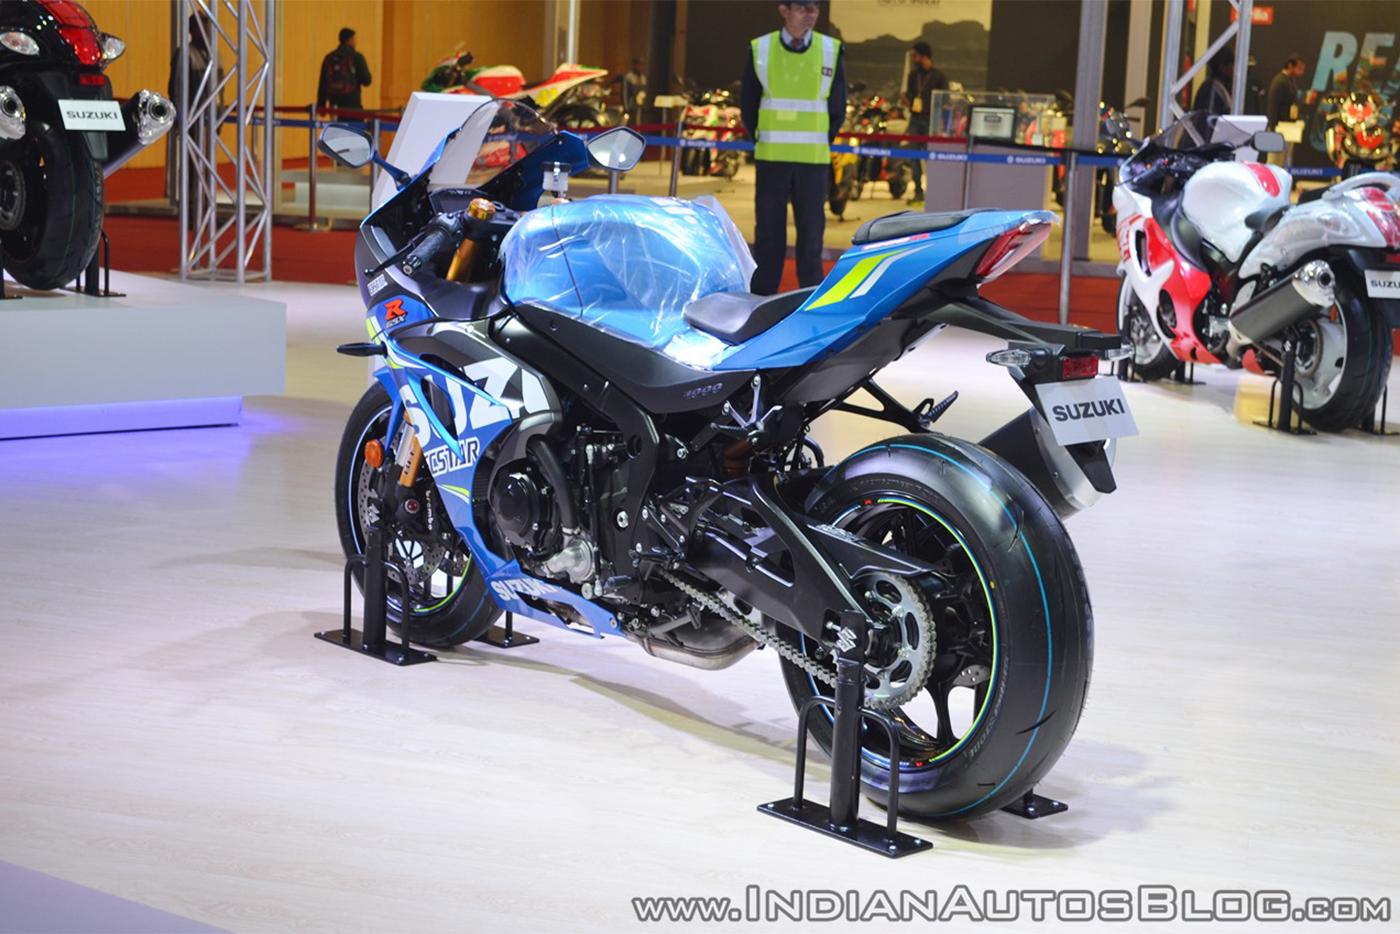 2018-suzuki-gsx-r1000r-blue-rear-left-quarter-at-2018-auto-expo.jpg